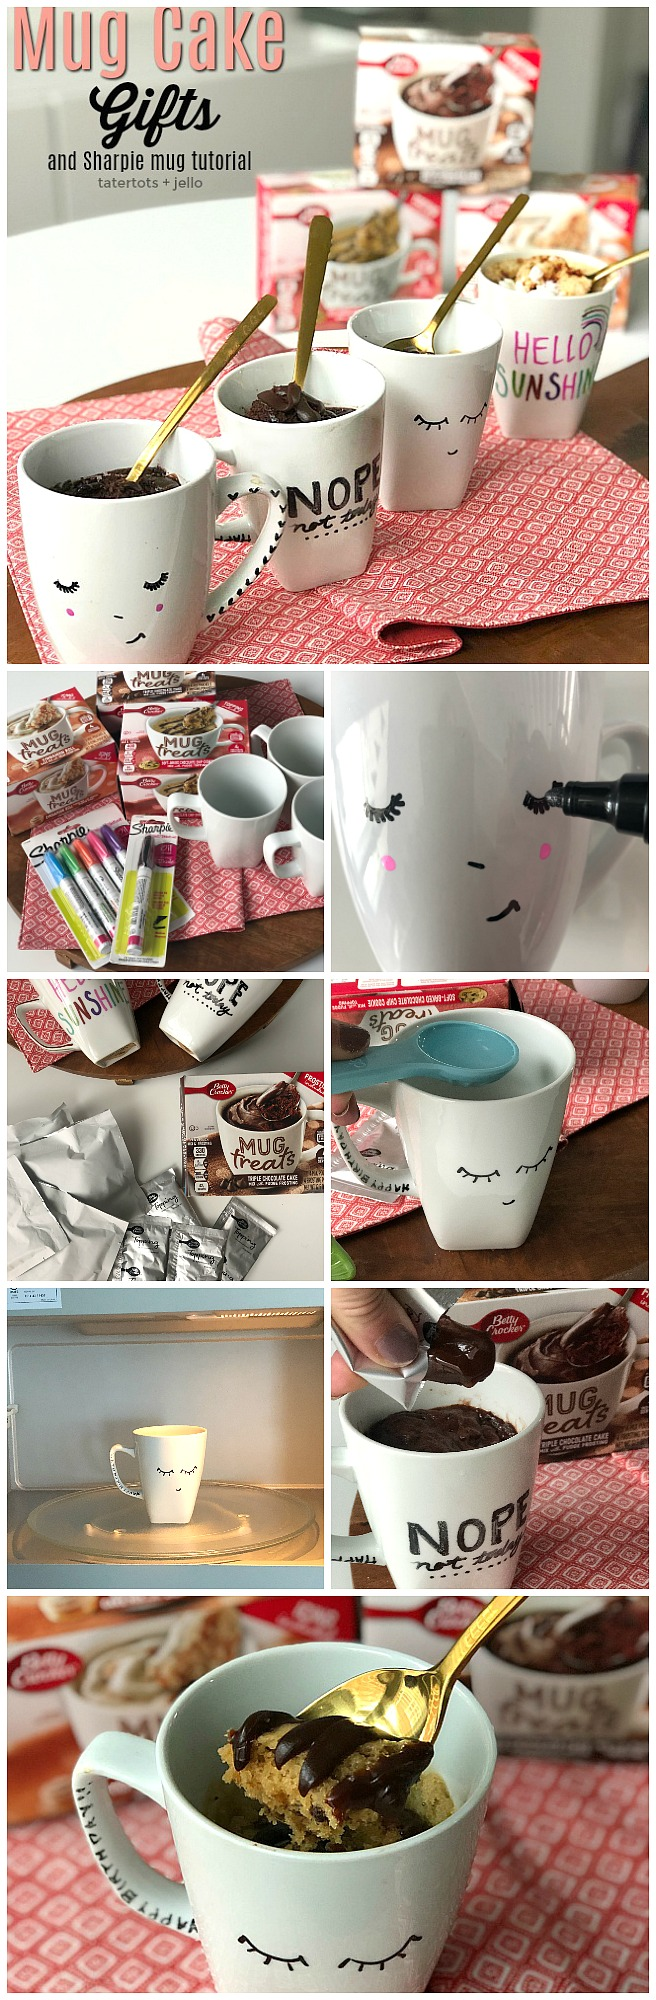 Sharpie Mugs And Mug Cake Gift Ideas Perfect Gift For Anyone